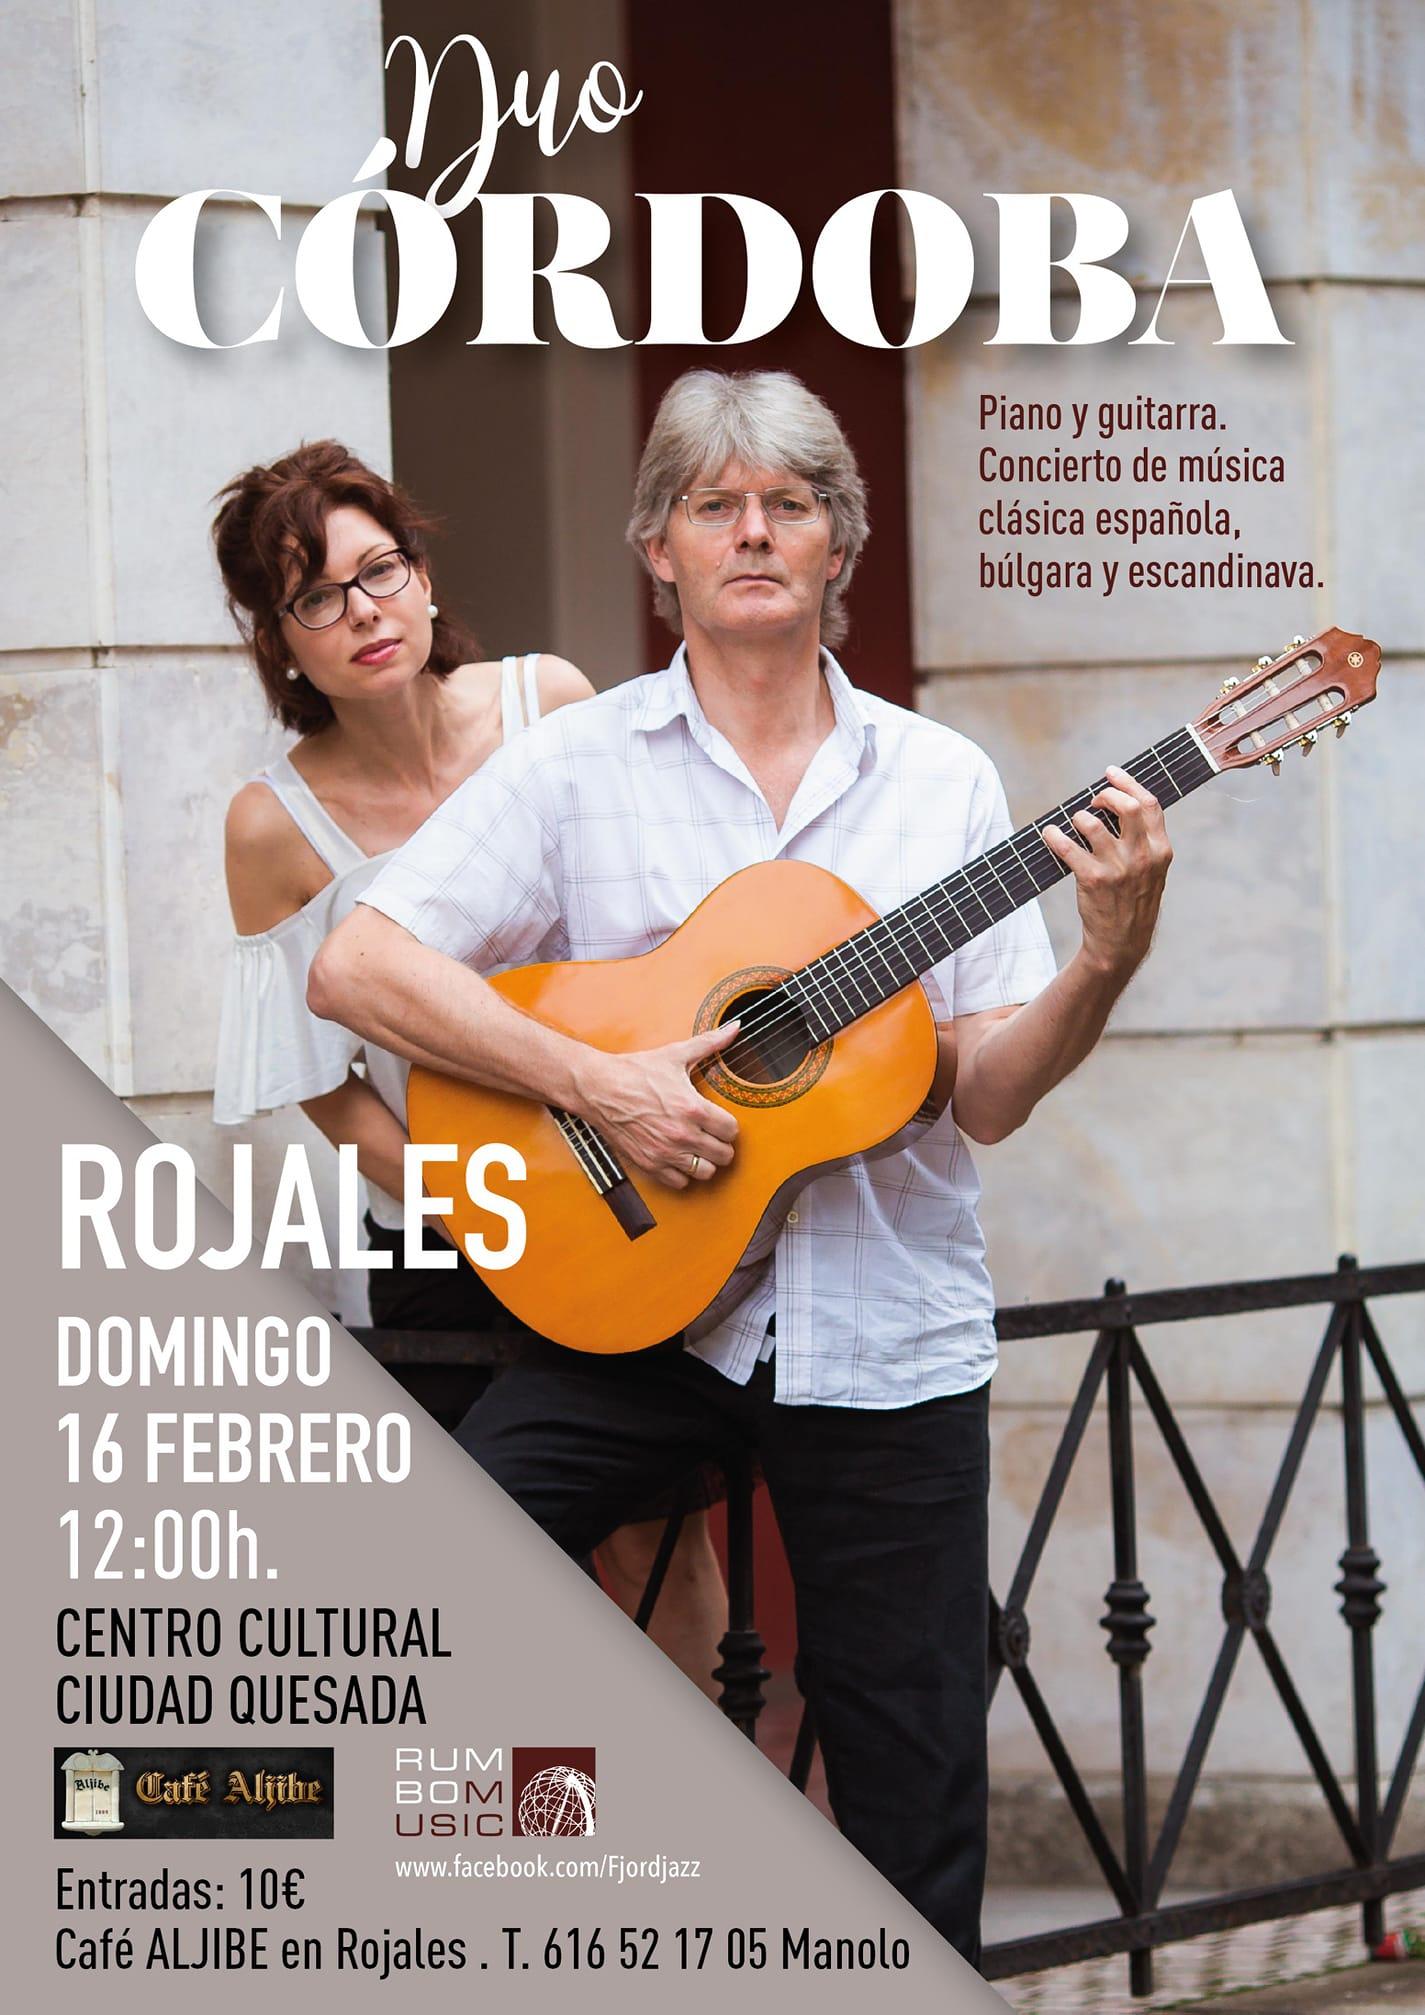 Duo Cordoba Rojales 2020 2